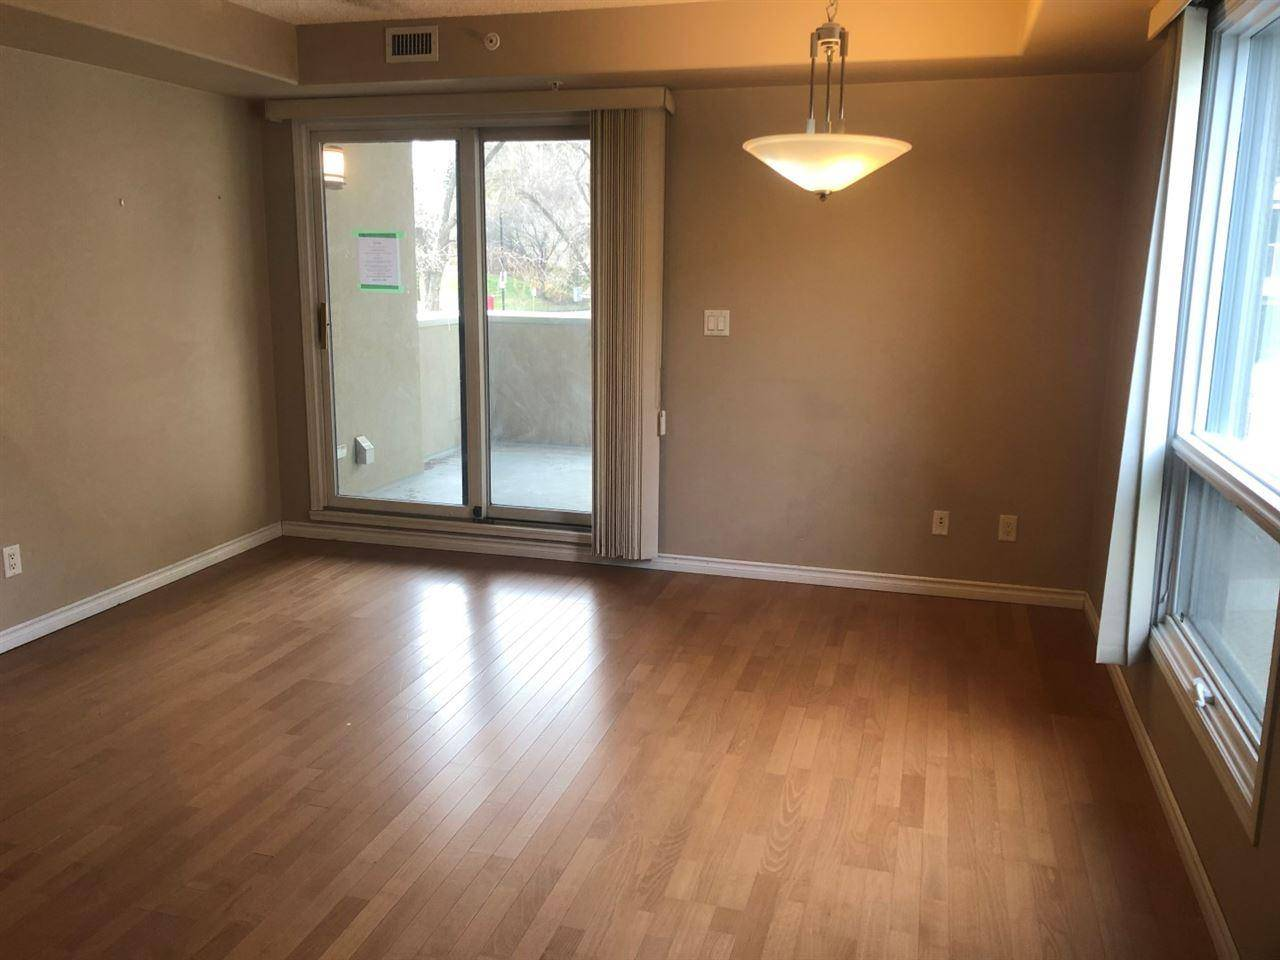 207 - 9707 106 Street Nw, Edmonton | Image 2